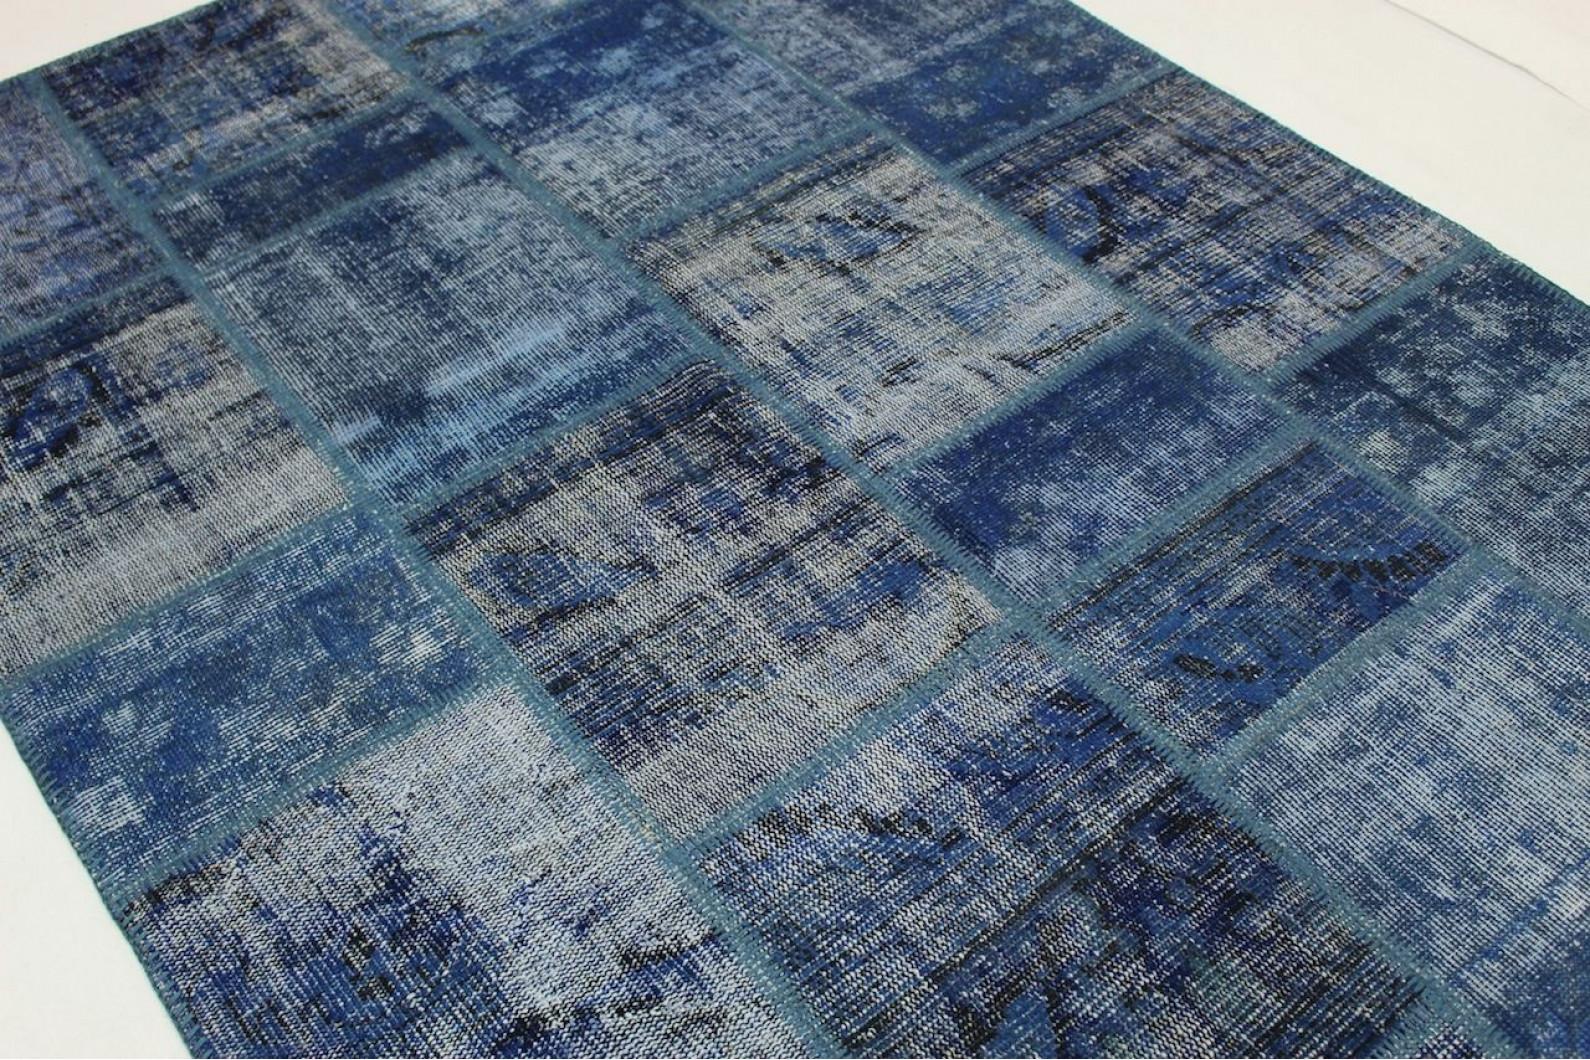 patchwork teppich blau in 240x170cm 1011 5007 bei. Black Bedroom Furniture Sets. Home Design Ideas